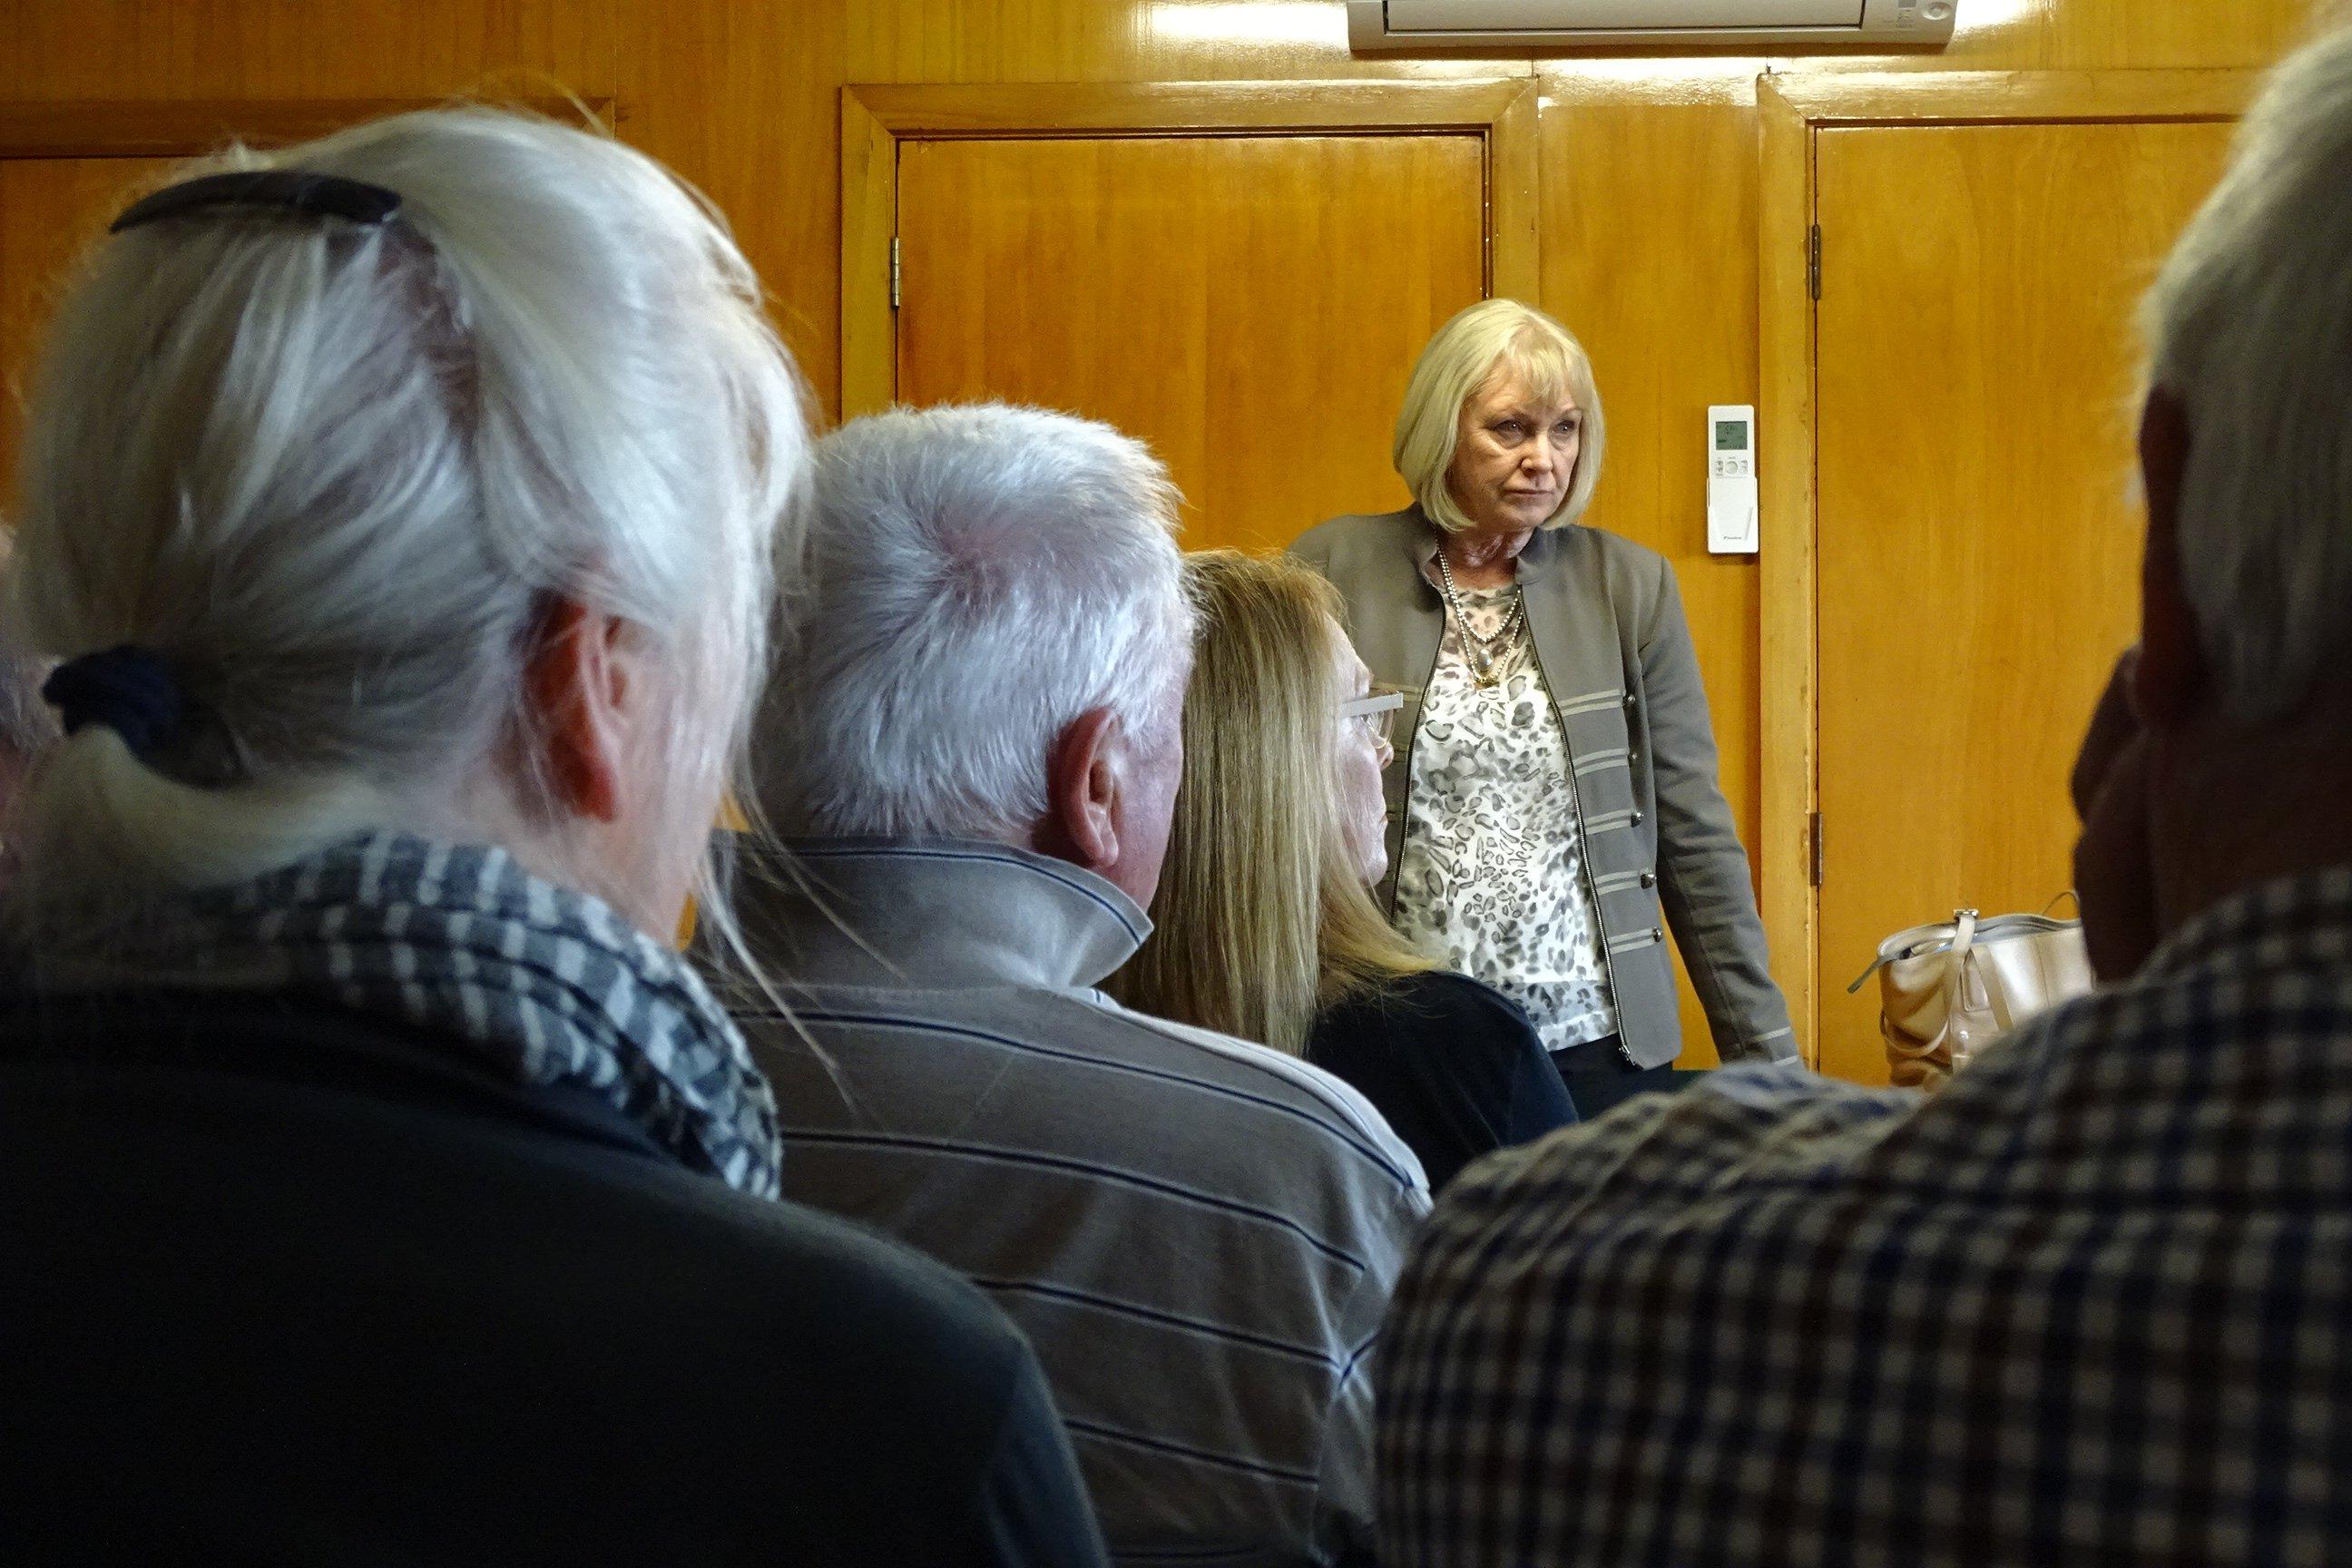 Waitaki MP Jacqui Dean meets Tarras residents yesterday to hear first hand their views on the...